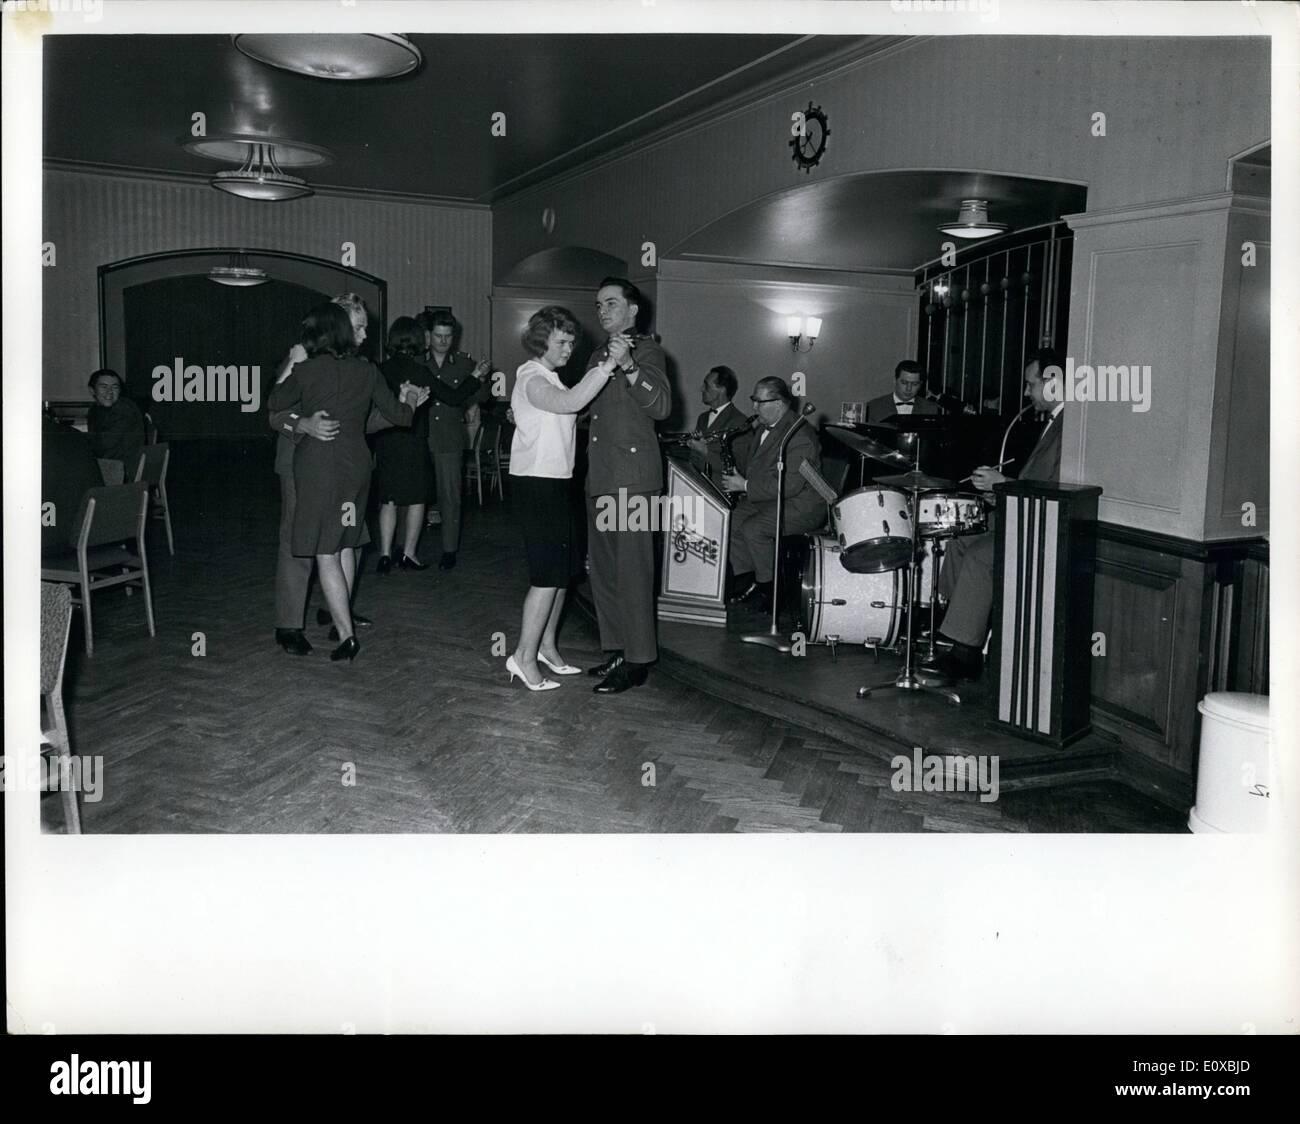 Mar. 03, 1966 - East German ''People's Army'' soldiers dancing at Frankfurter Tor'' Restaurant. - Stock Image